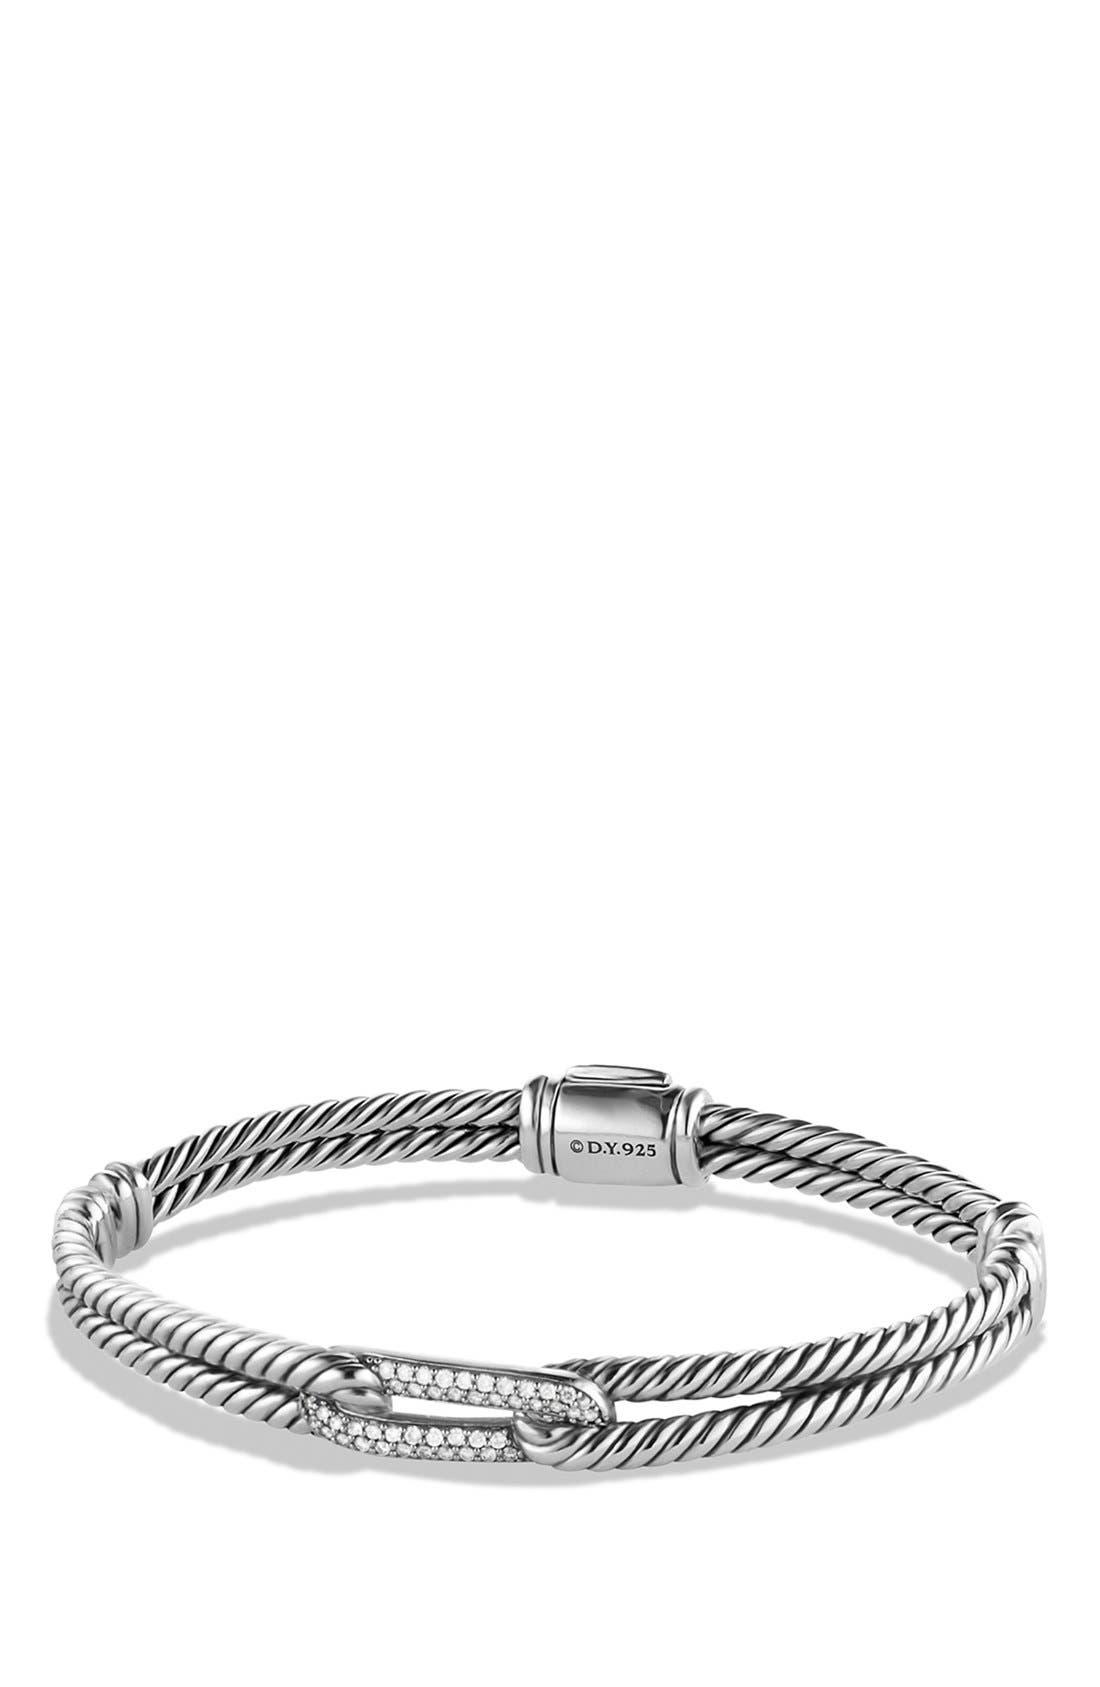 Petite Pavé 'Labyrinth' Mini Single Loop Bracelet with Diamonds in Gold,                         Main,                         color, Diamond/ Silver